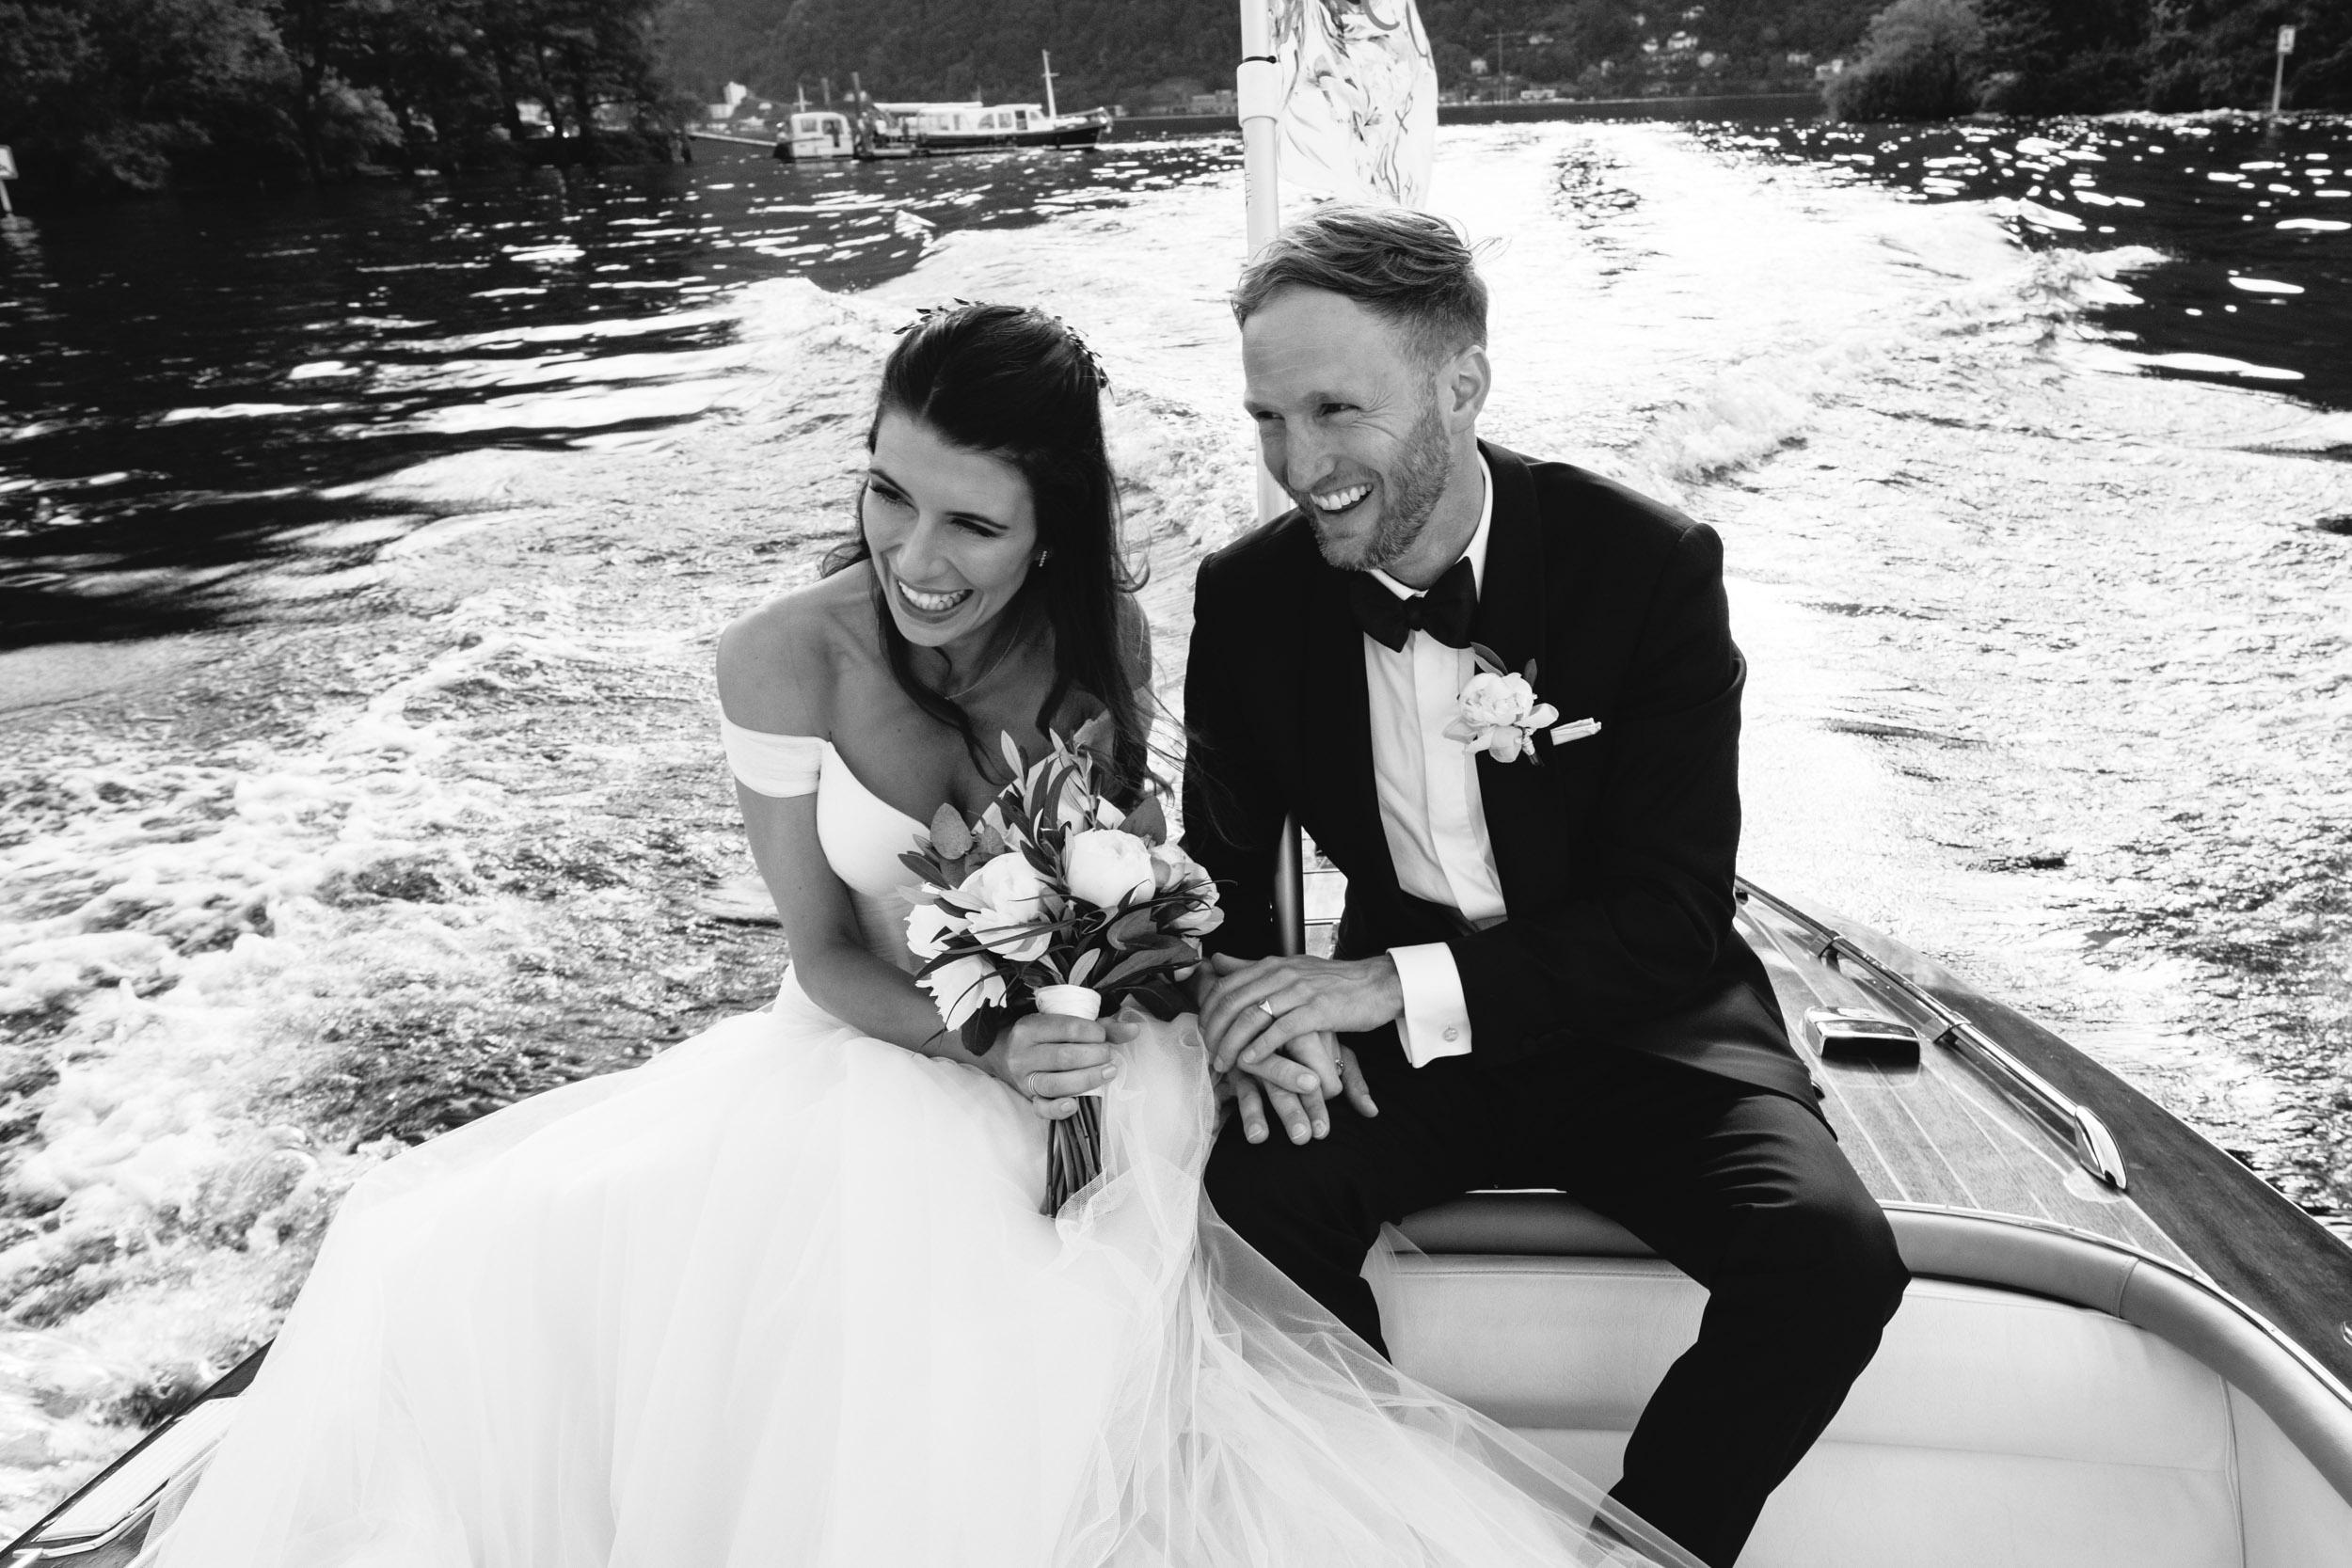 olivia-andreas-wedding-switzerland-426.jpg